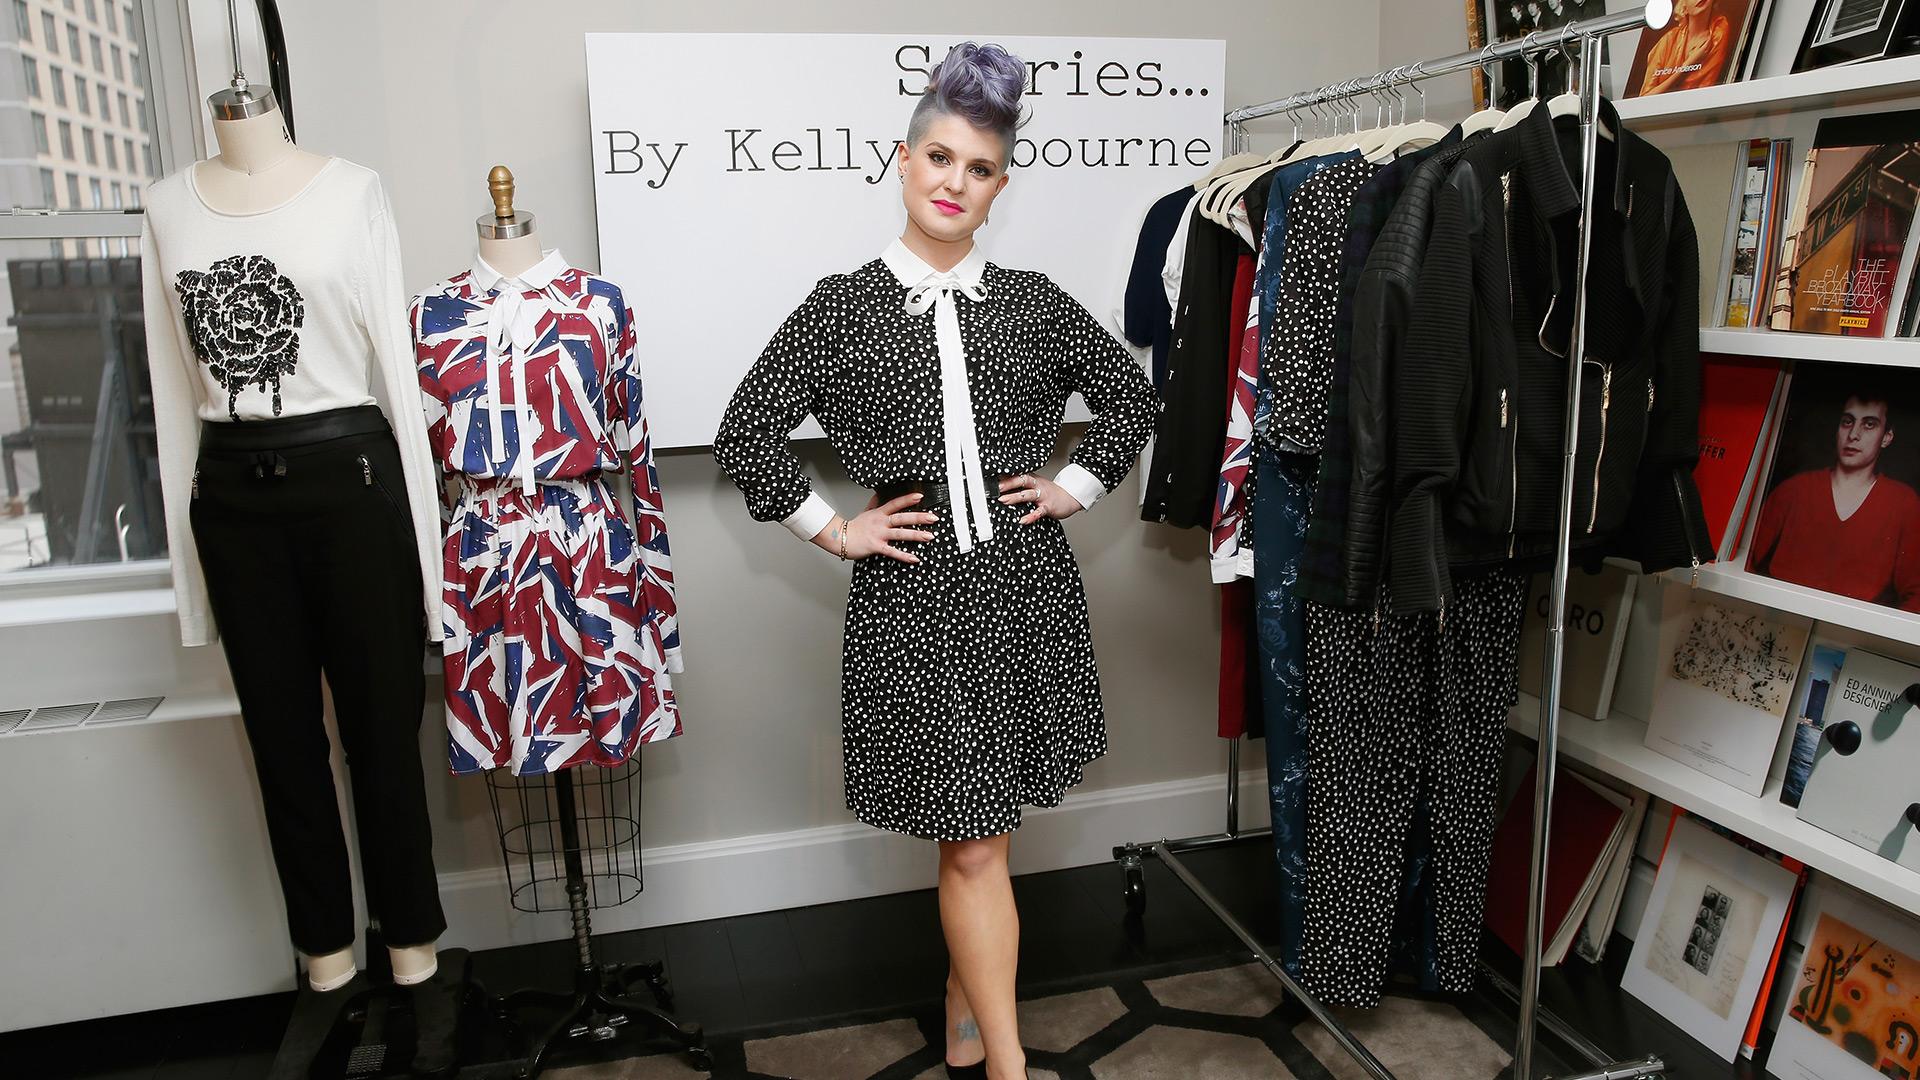 Kelly Osbourne's new fashion line fits all sizes